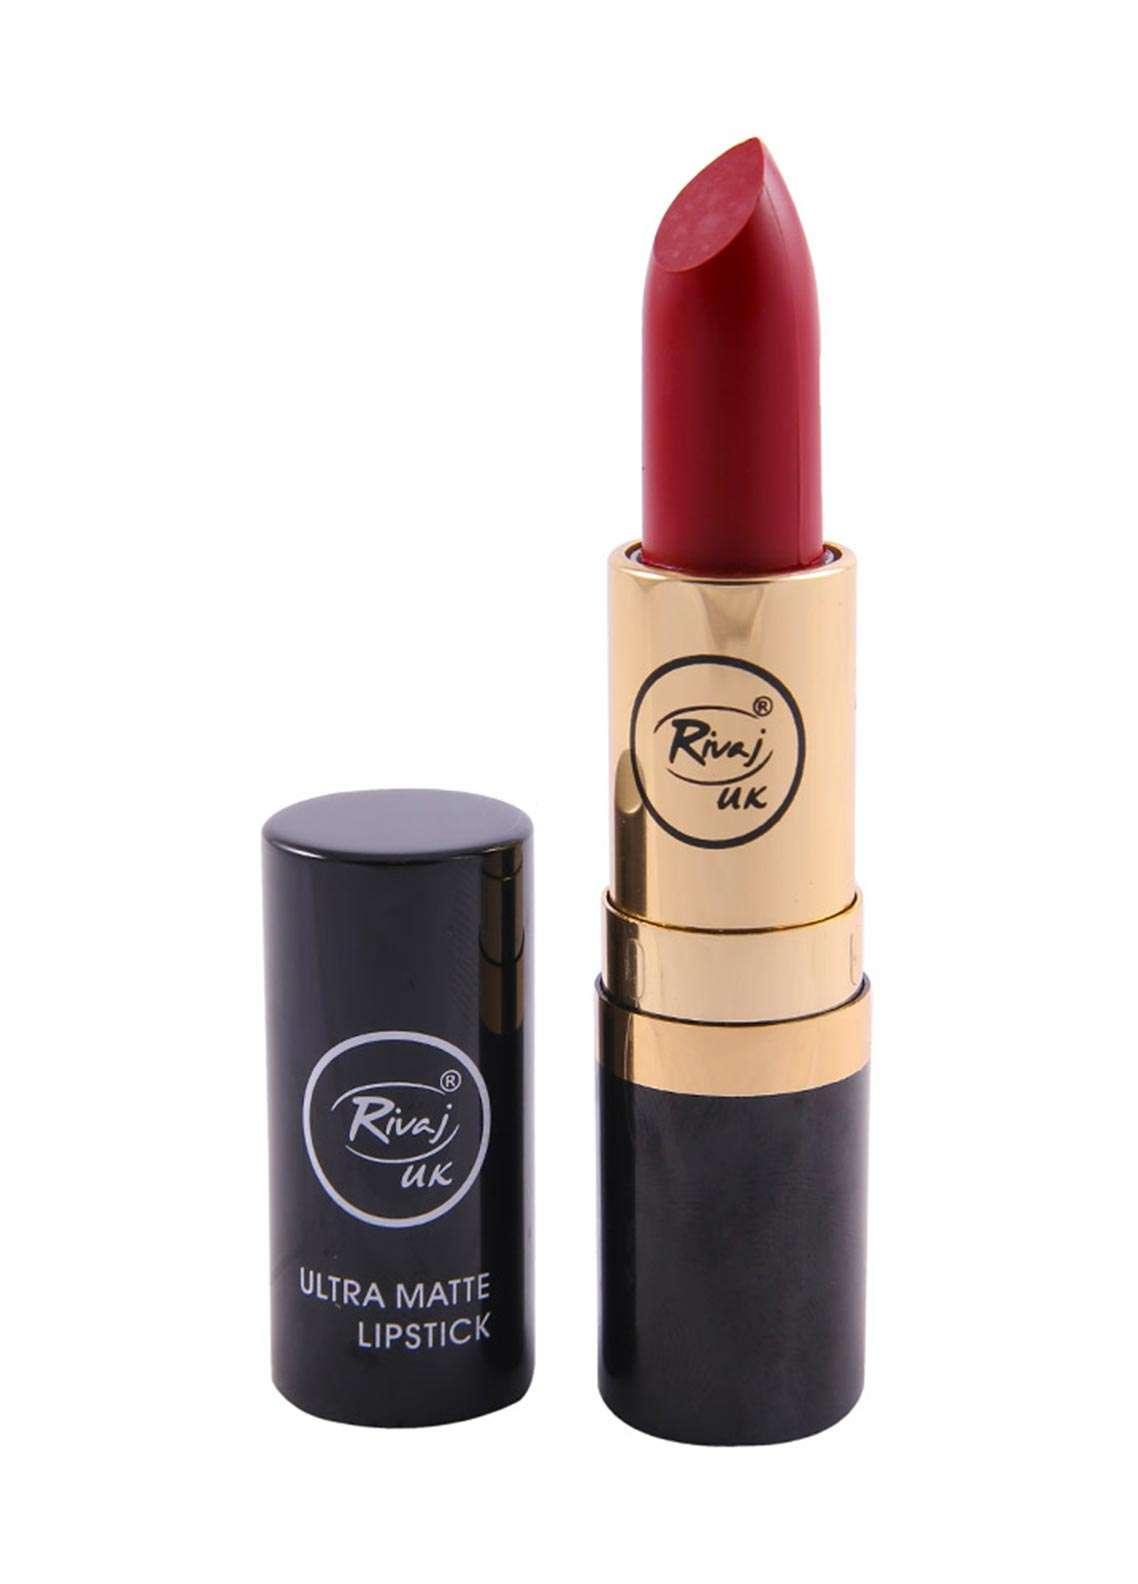 Rivaj UK Ultra Matte Lipstick - 22